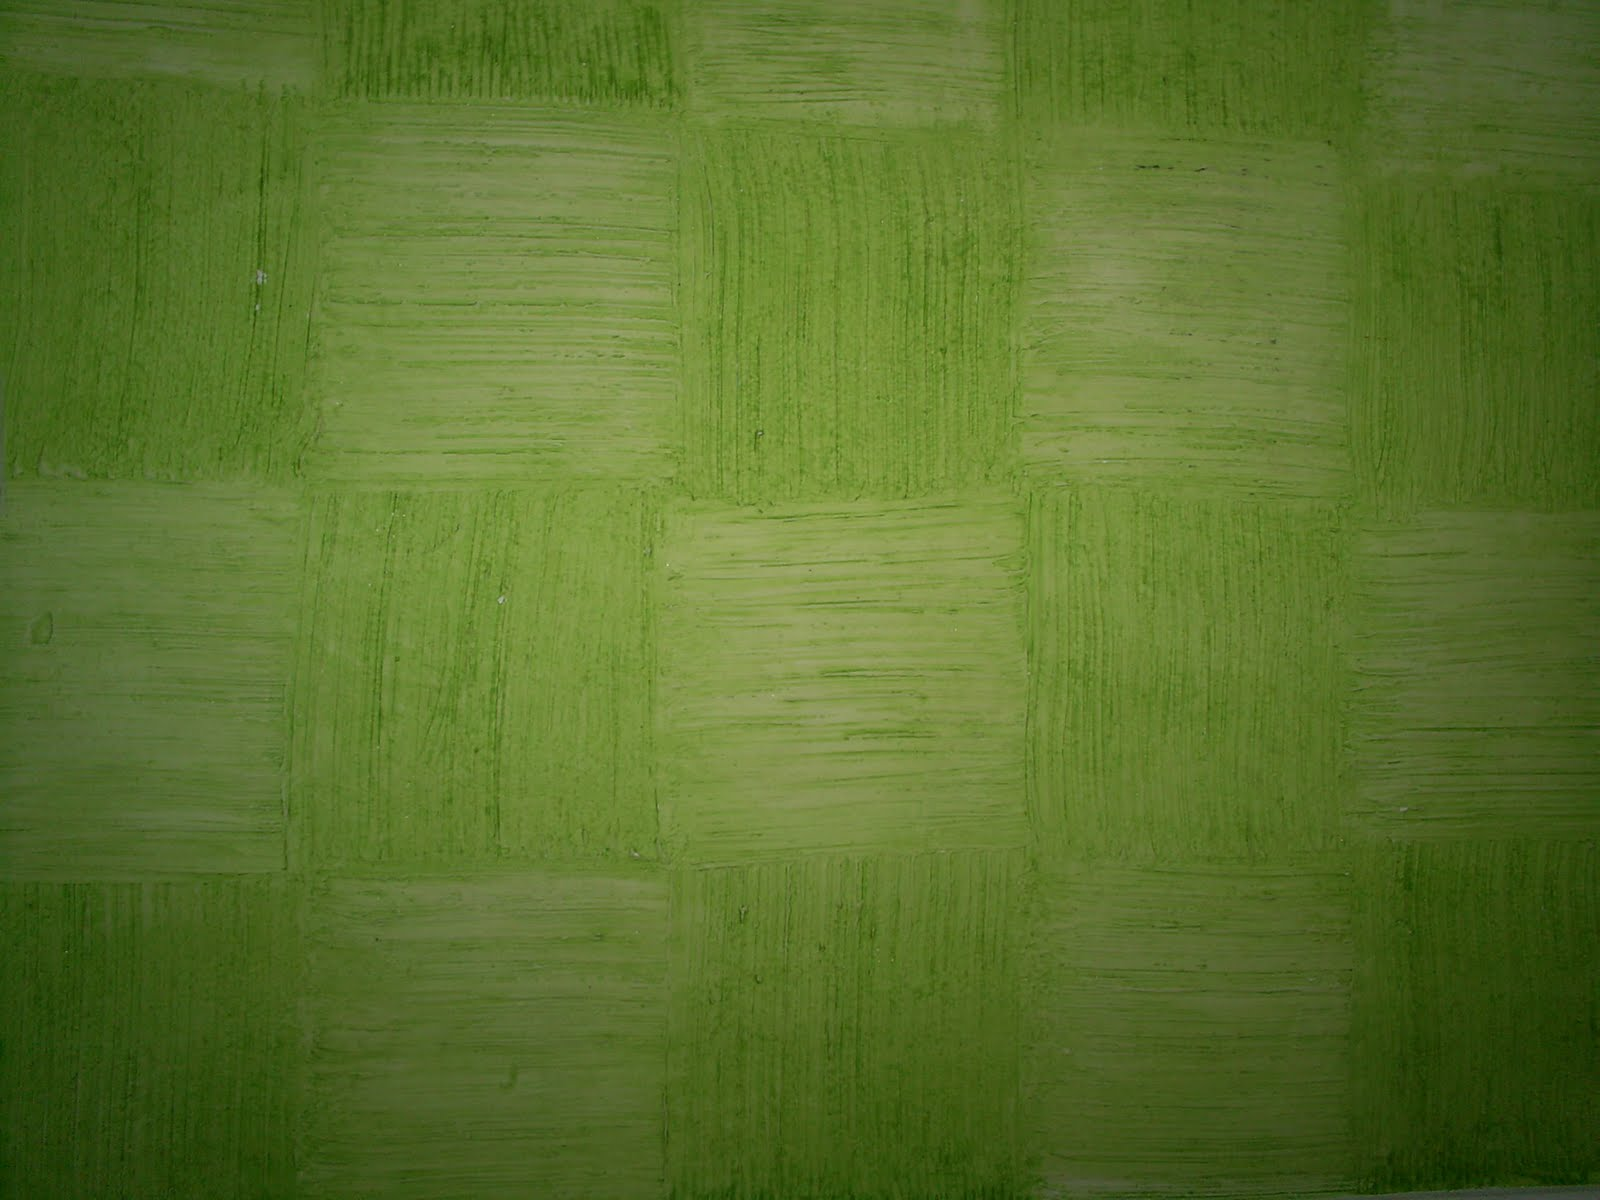 J ssica paiva textura de parede - Textura de pared ...